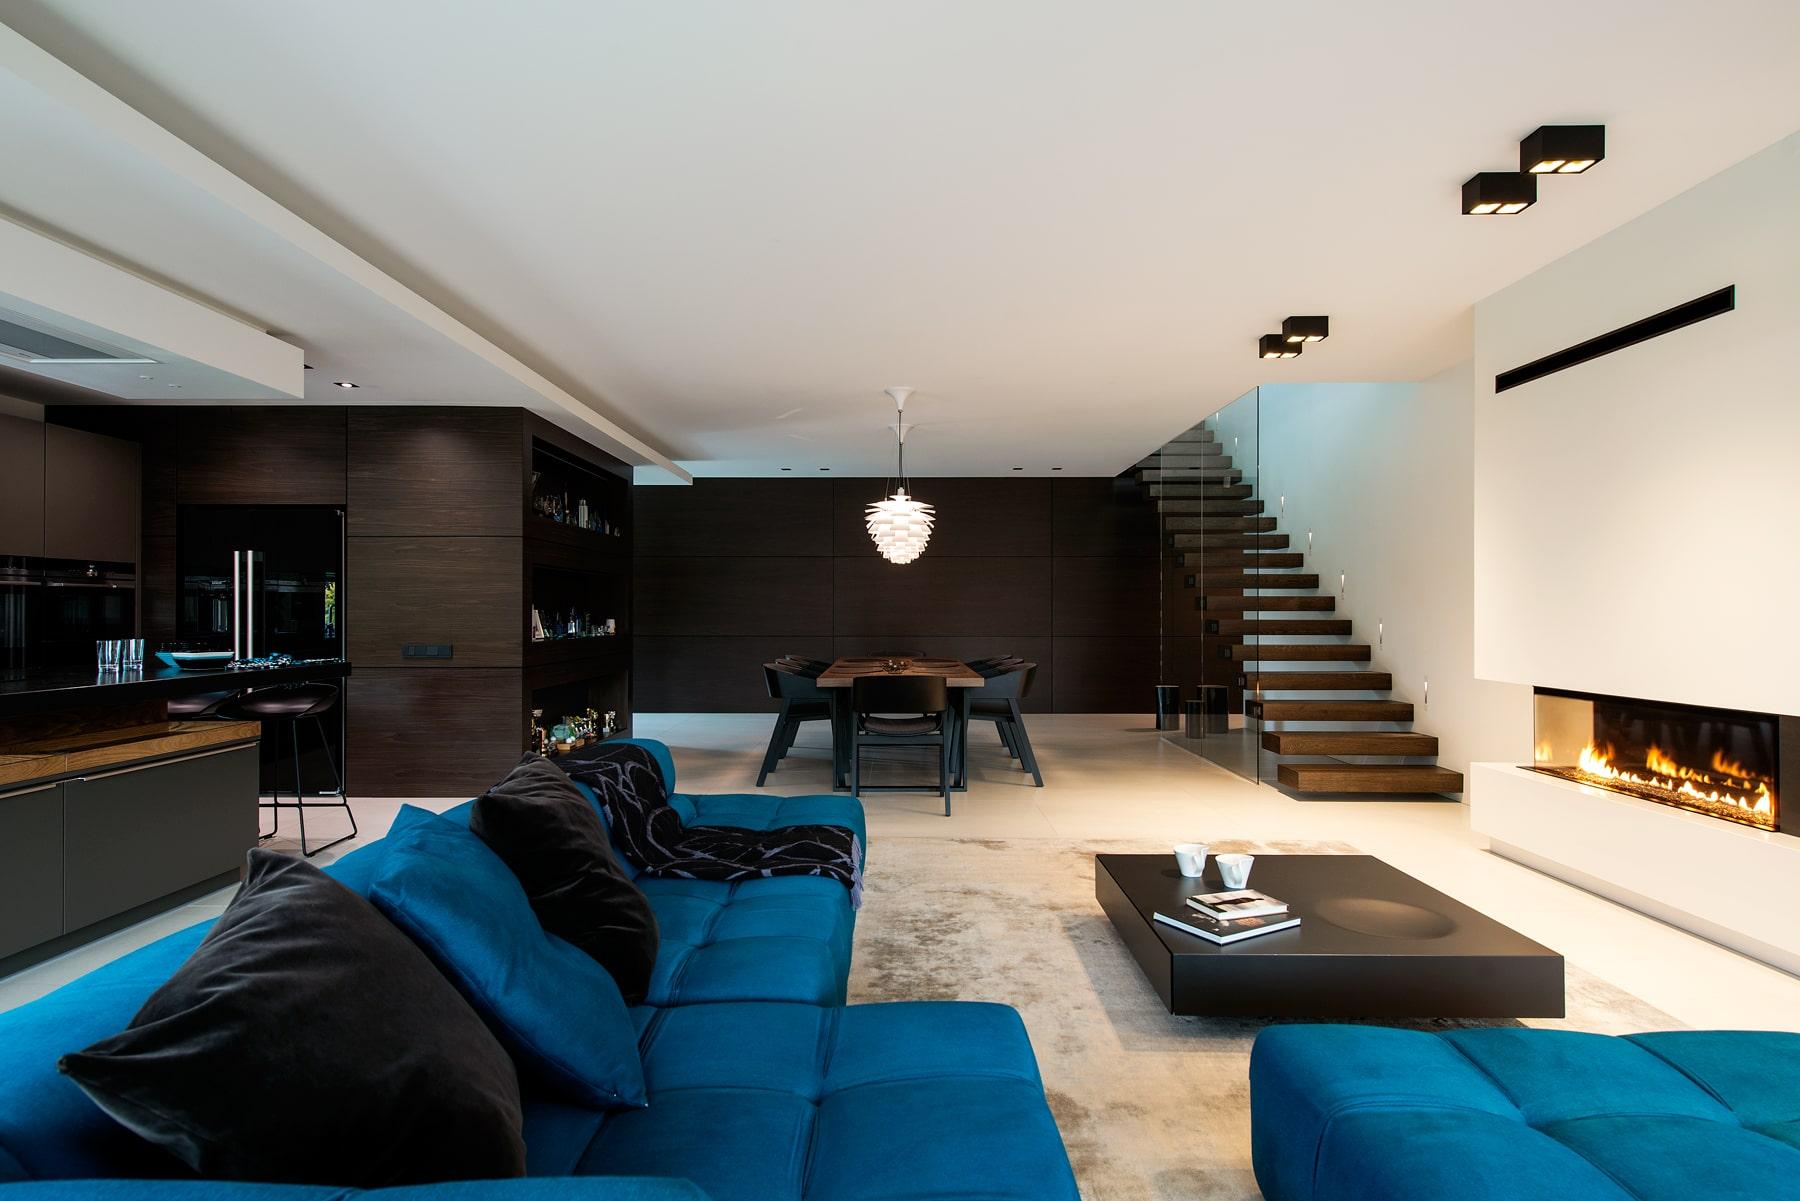 Living room of a private estate in Pirita